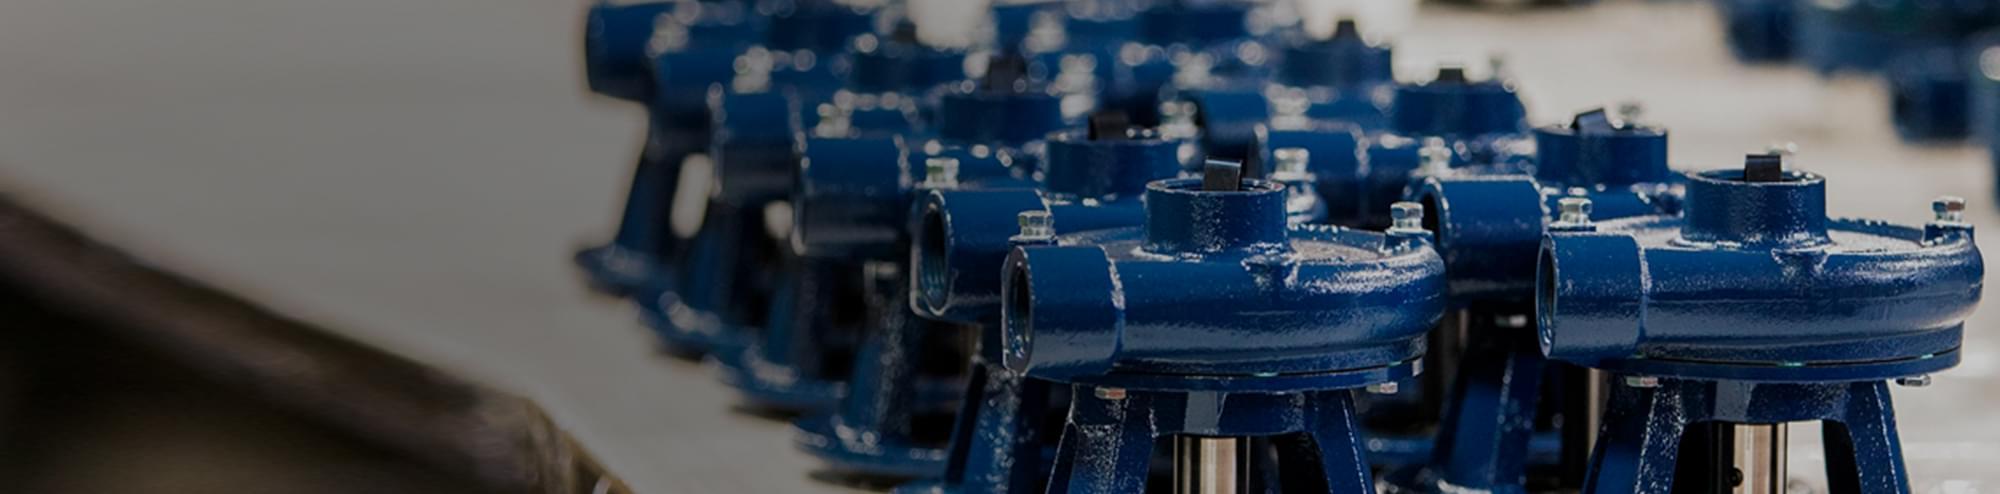 Horizontal Centrifugal Pumps - Price Pump